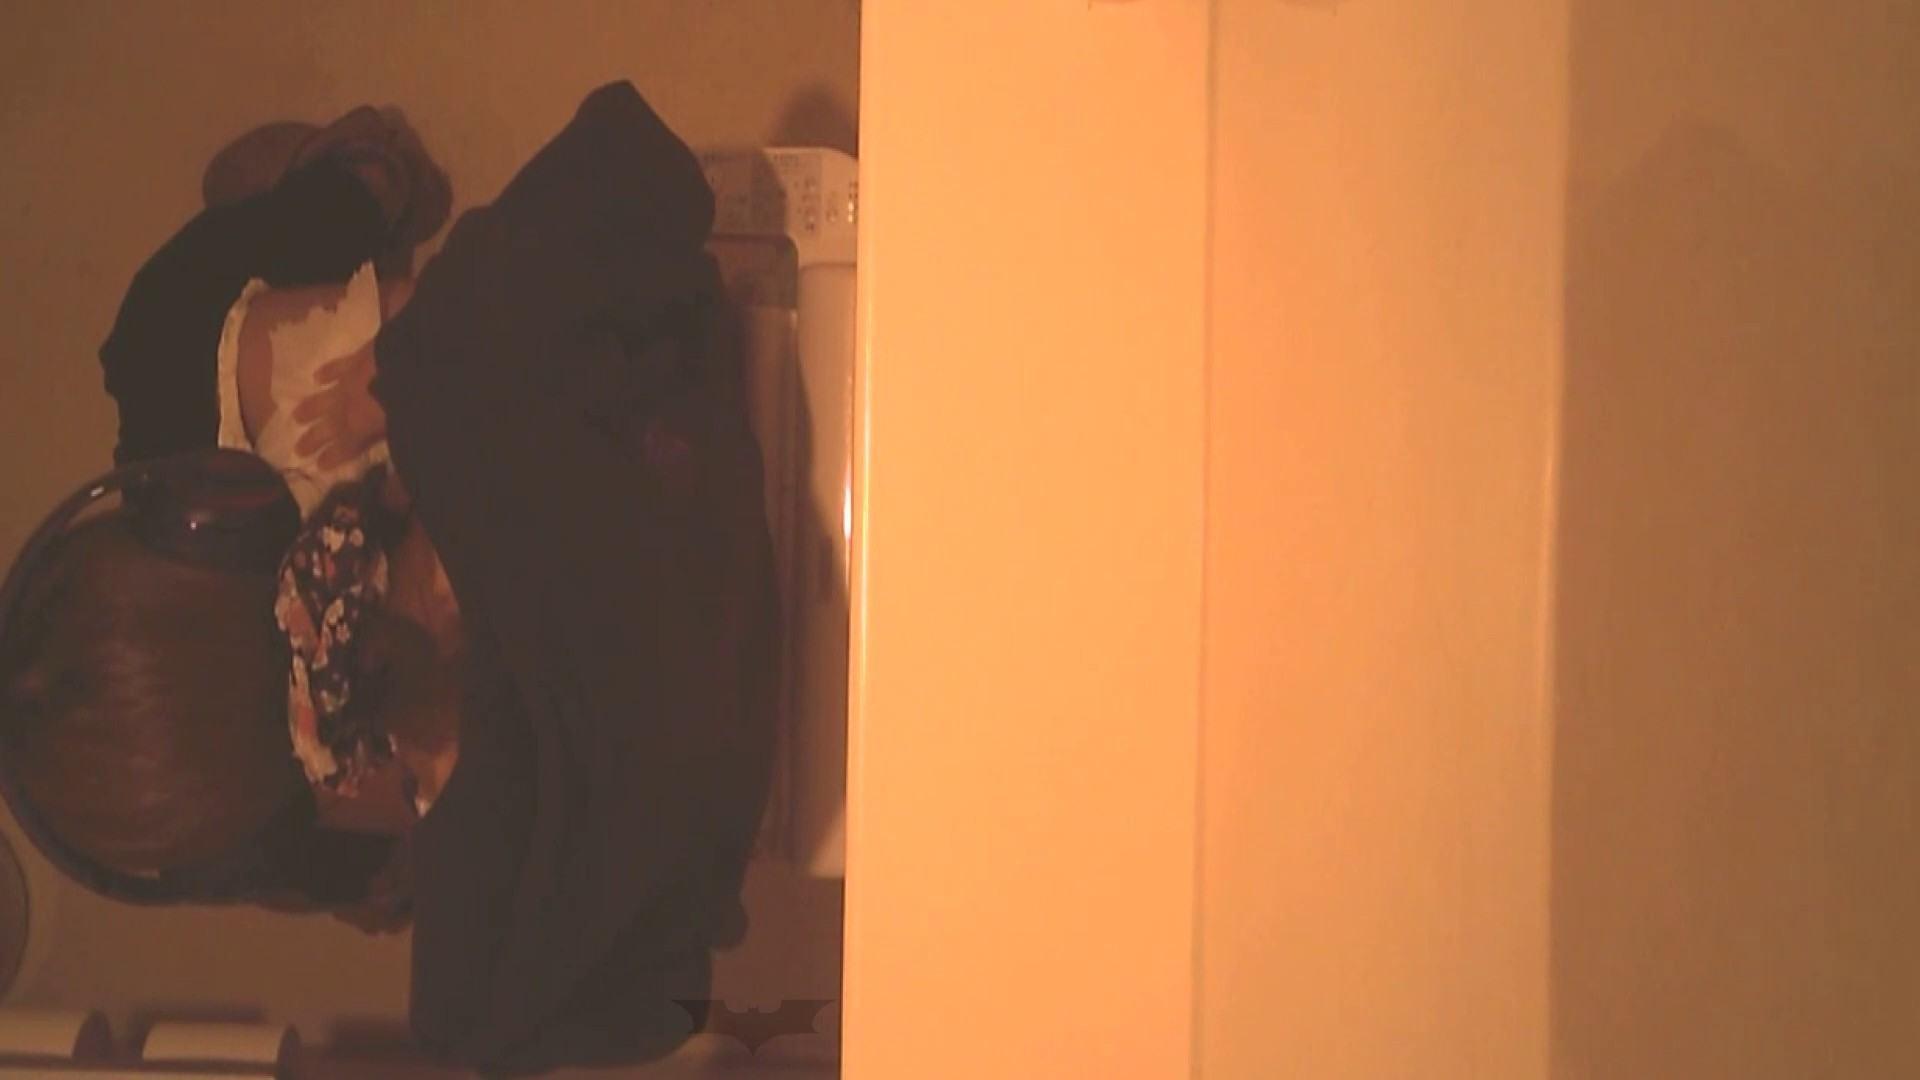 潜入!!全国女子洗面所盗撮 Vol.07 投稿 セックス画像 110画像 38